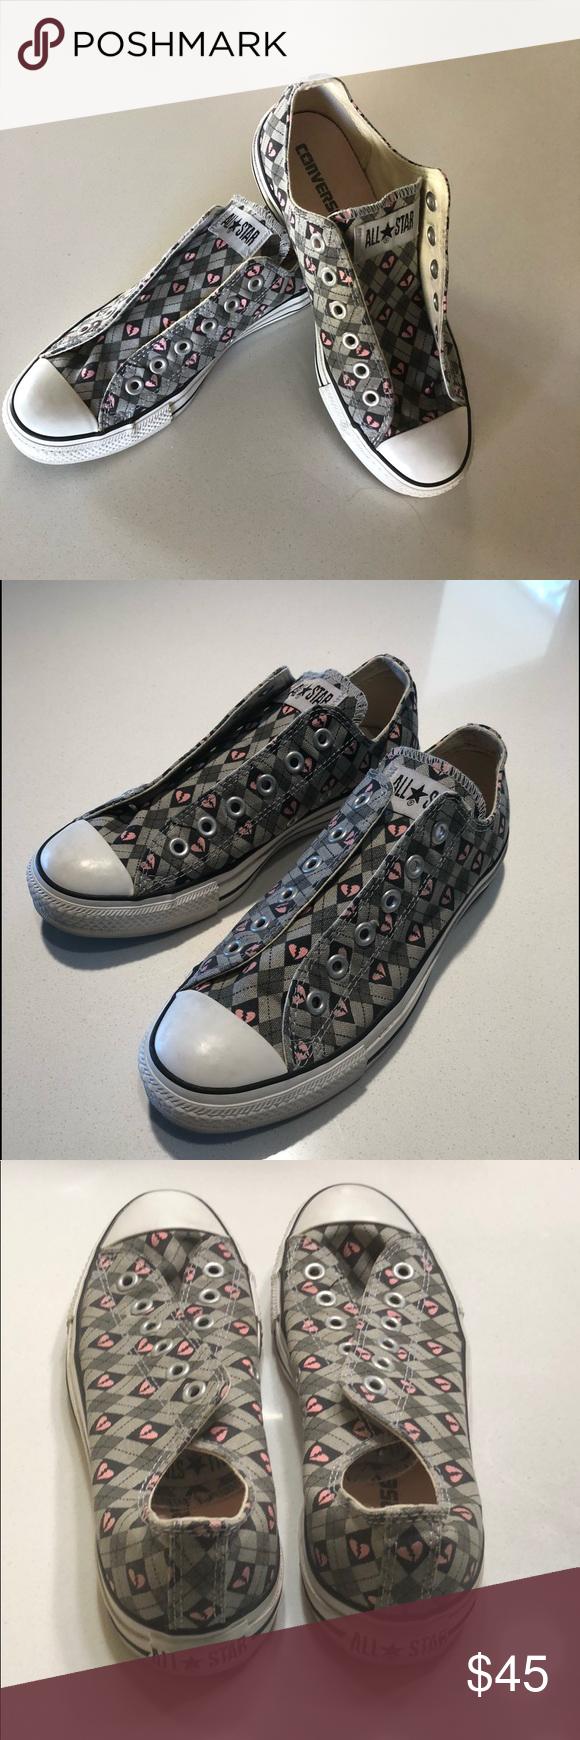 "521eaeee95d4bb Converse ""Broken Hearts"" 💓 Adorable Converse All-Star ""Broken Hearts""  sneakers"